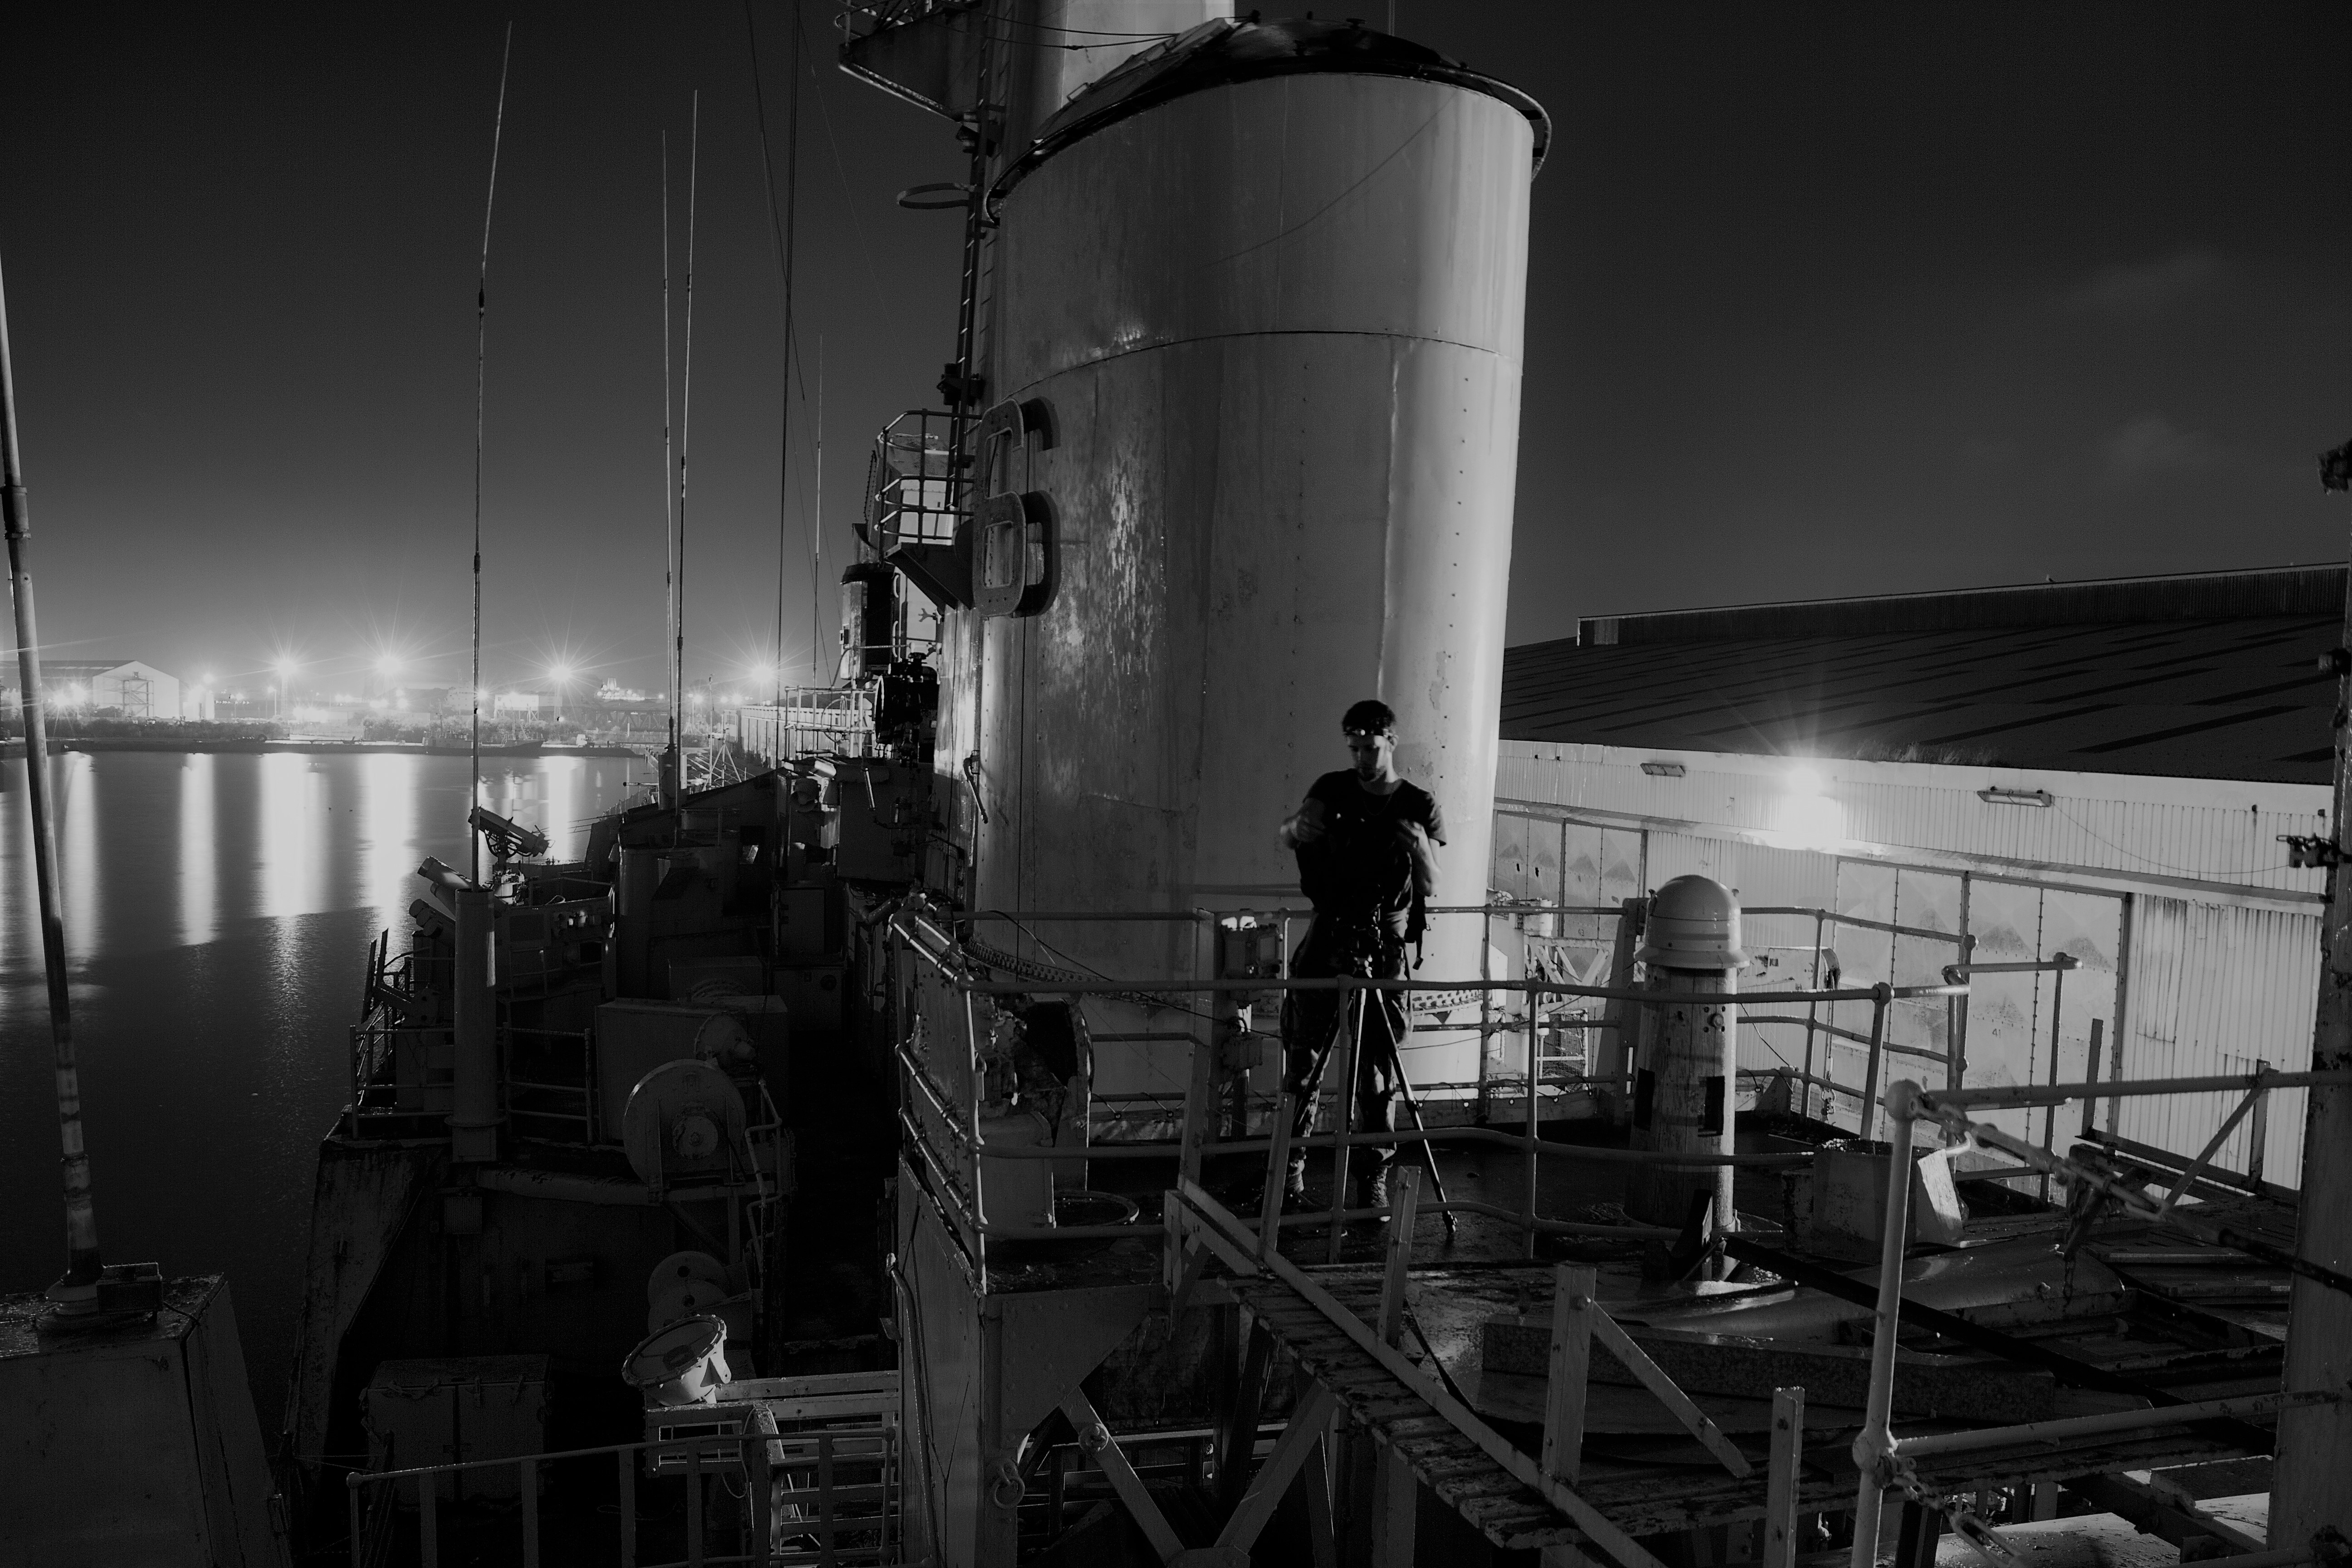 Urban Explorer Aboard Derelict Frigate by Tom Blackwell CC A N$ 1